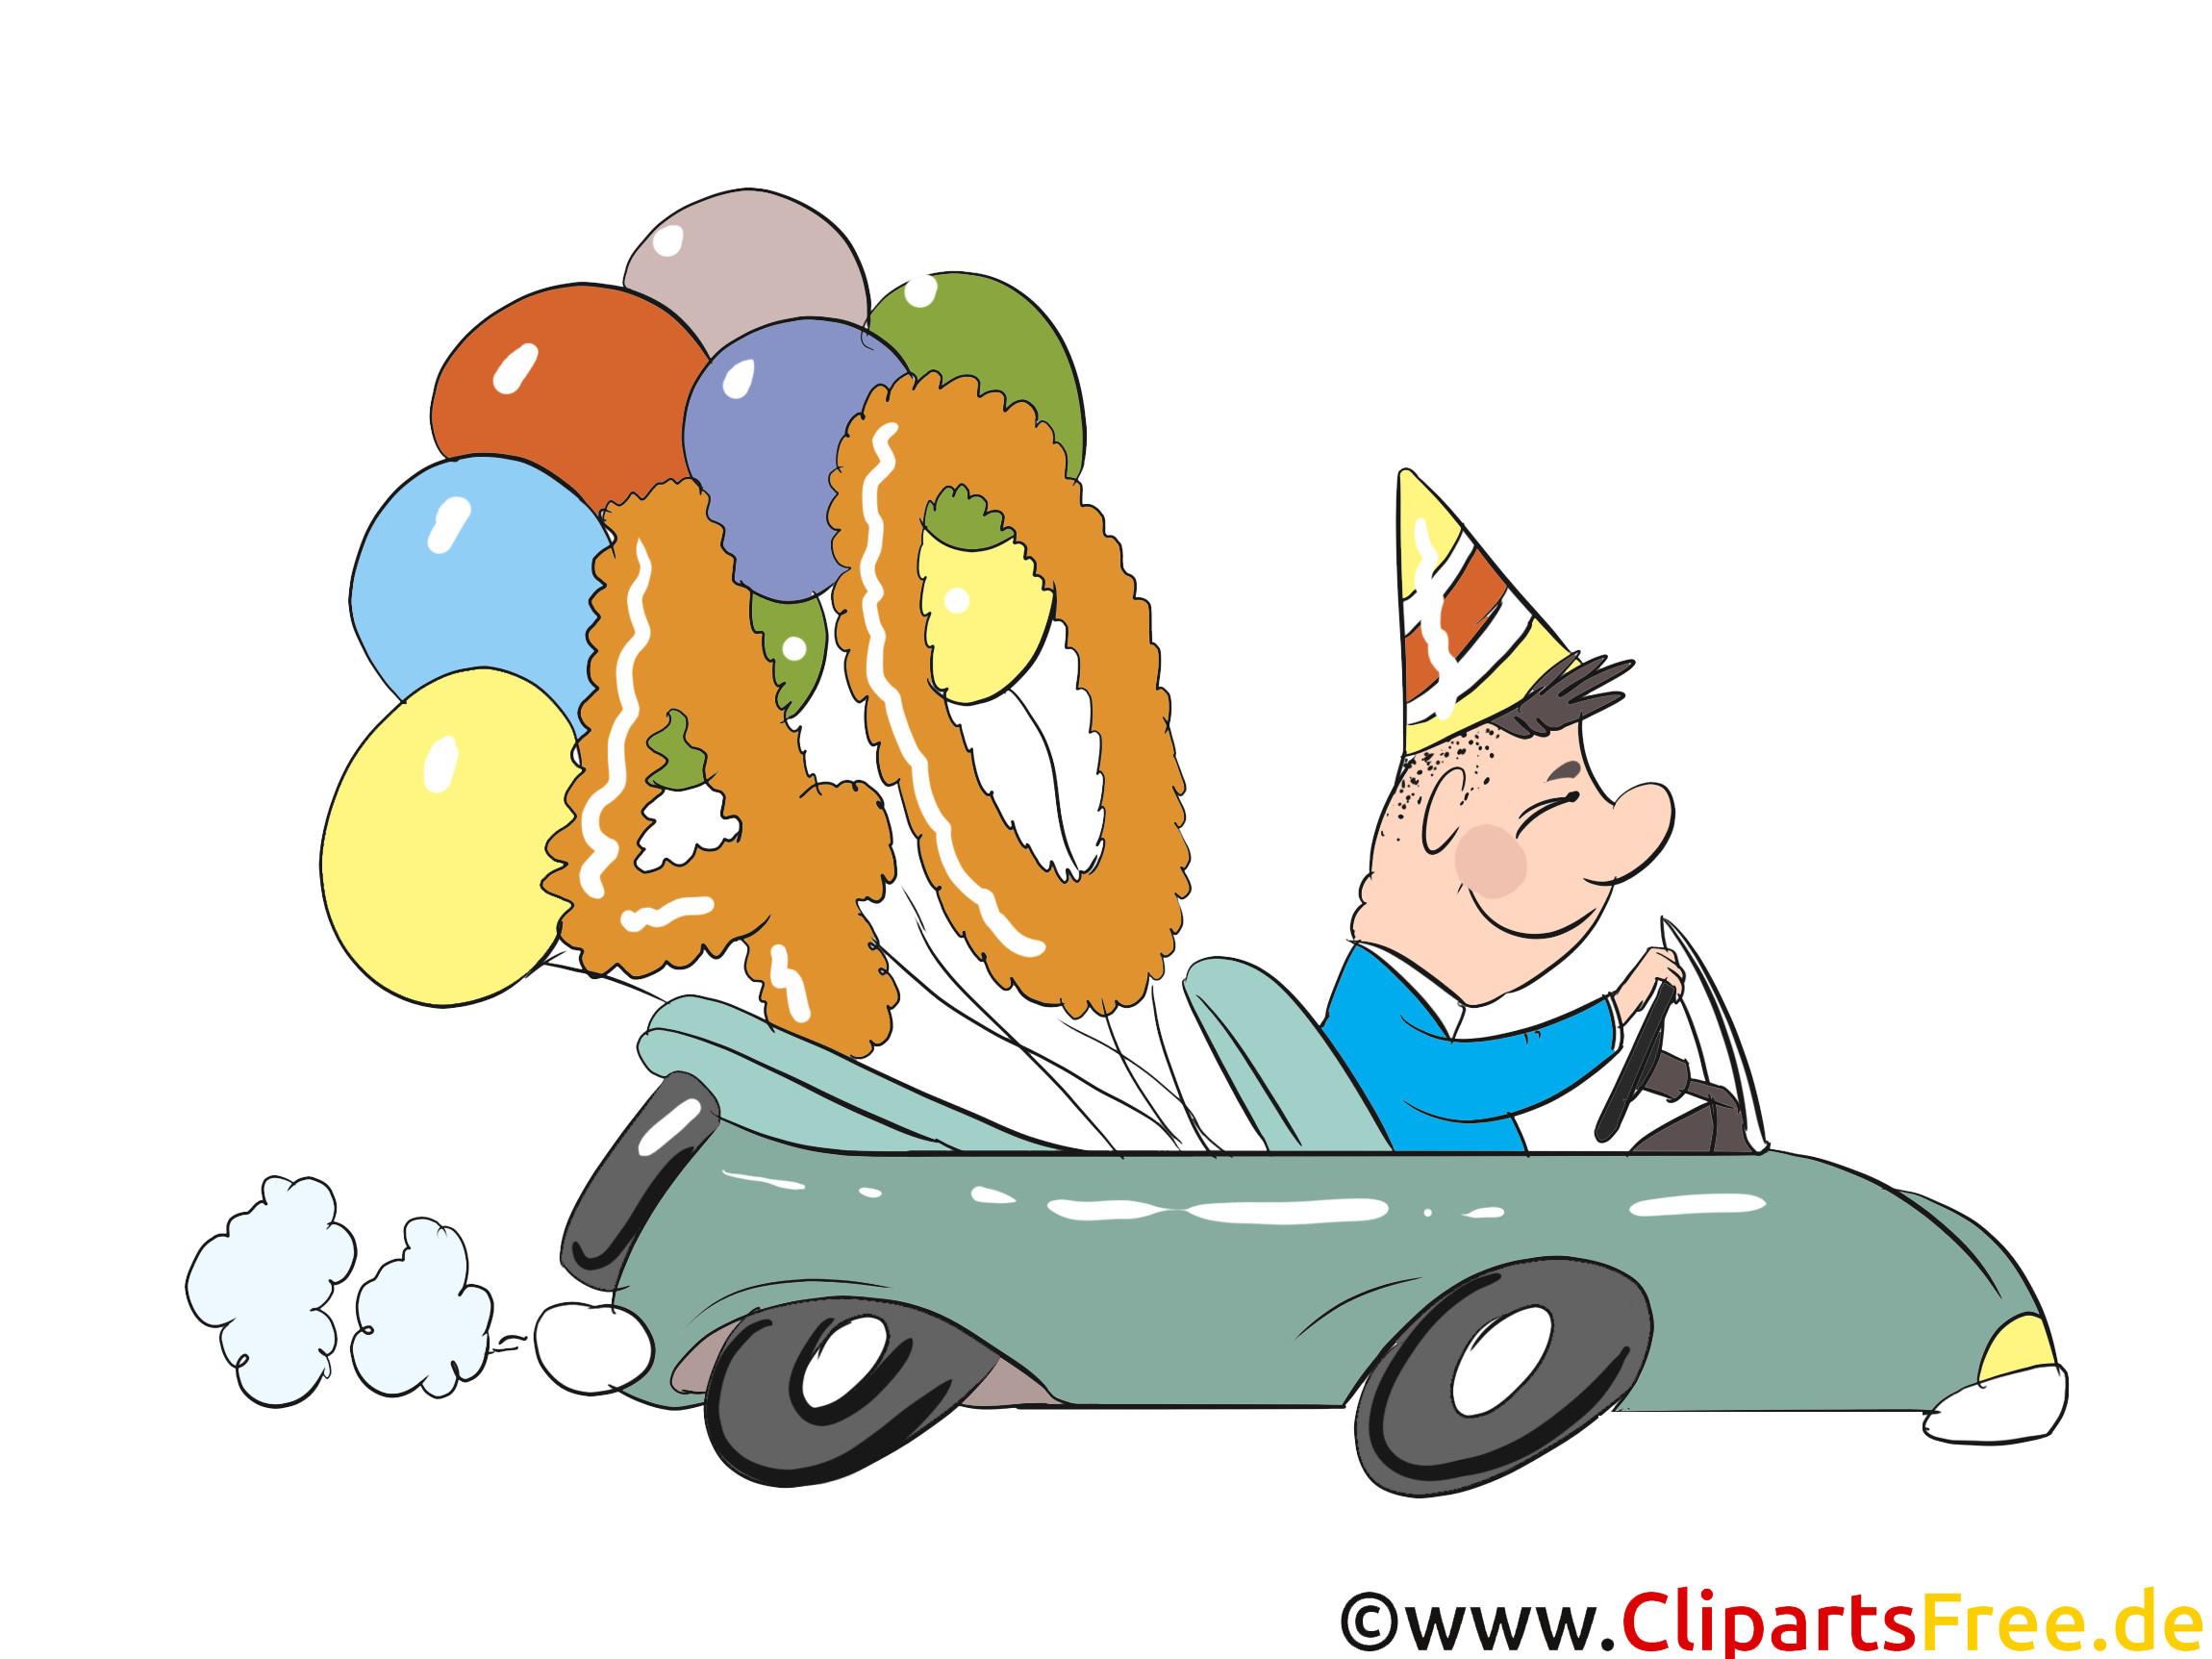 Geburtstagswünsche 40. Geburtstag  Geburtstagswünsche lustig zum 40 Geburtstag Karte